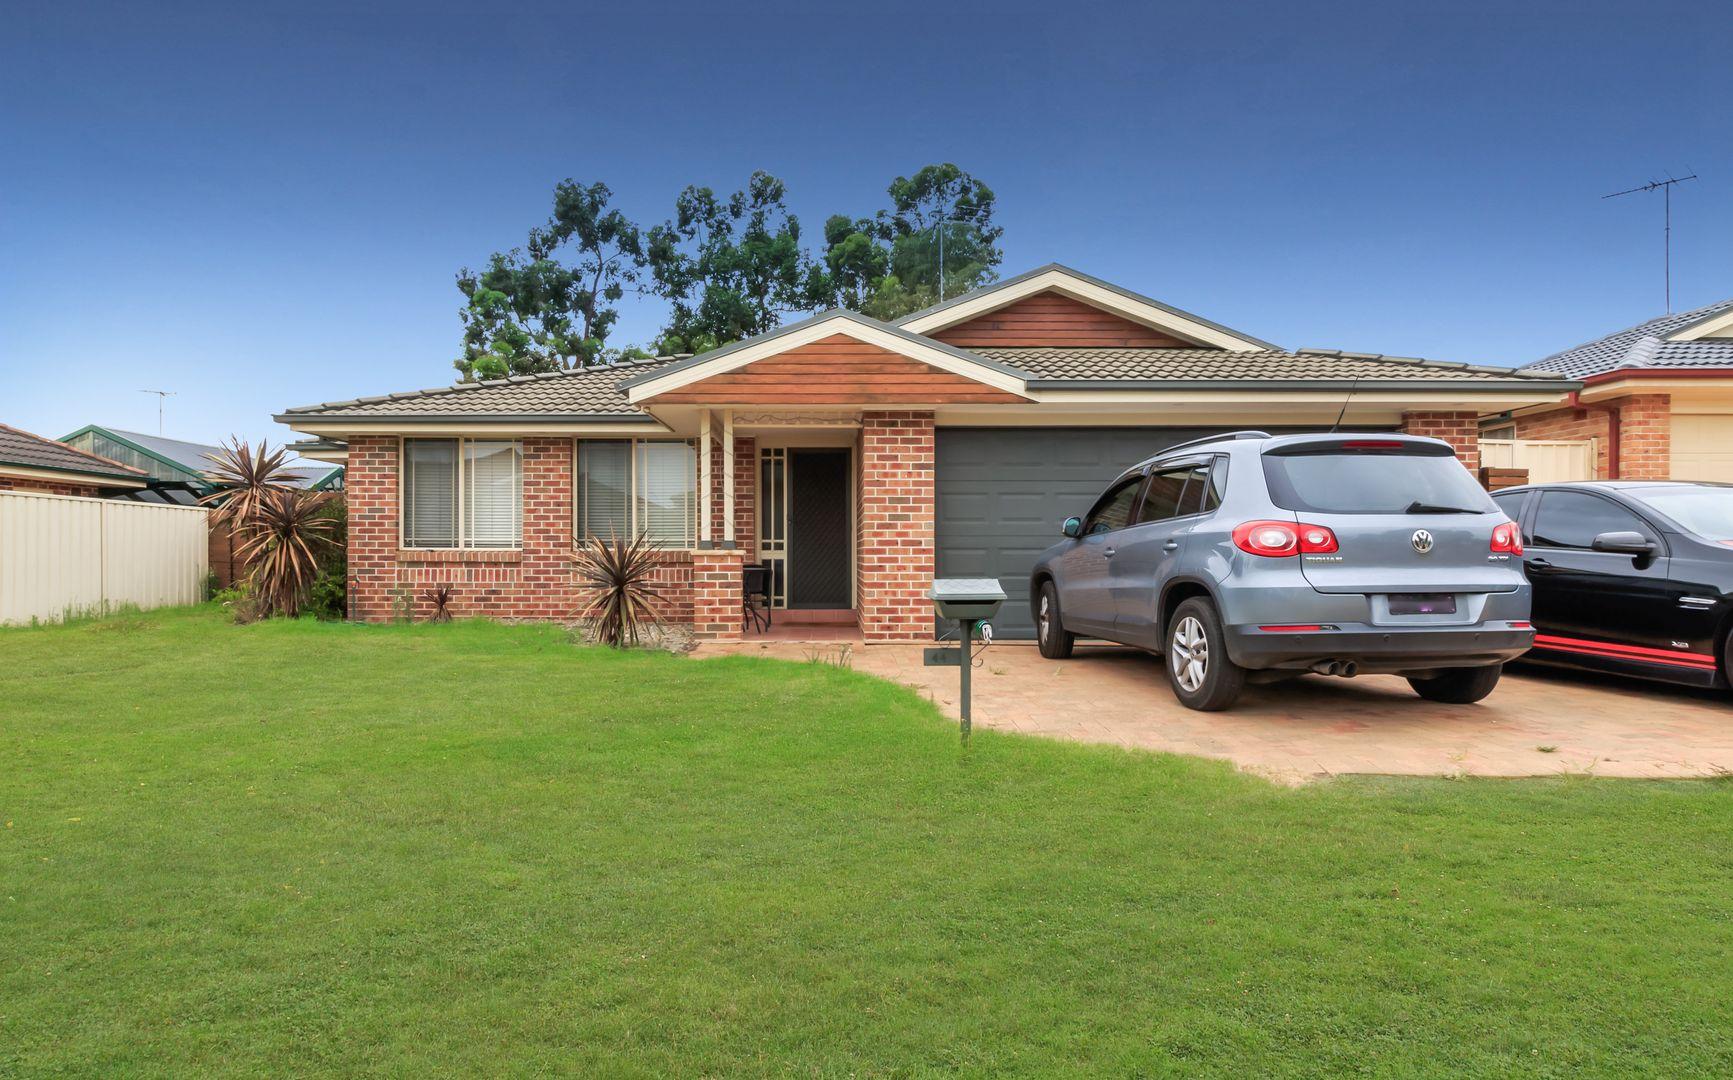 44 Kiber Drive, Glenmore Park NSW 2745, Image 0